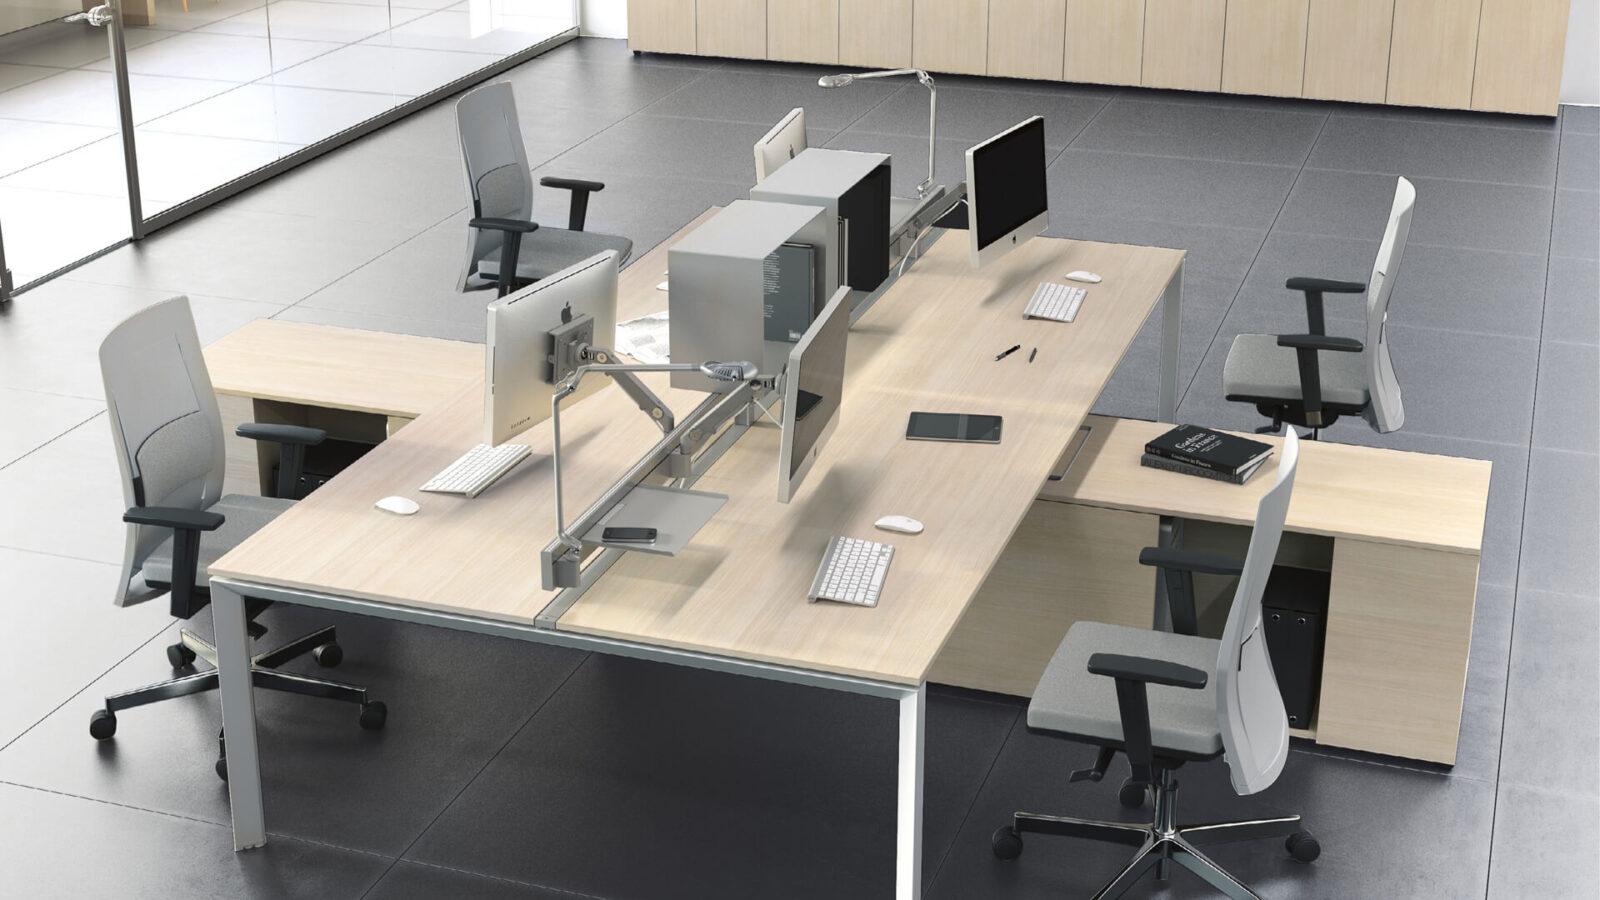 Uffici operativi mobili sedute per ufficio torino adv eu for Mobili per ufficio torino